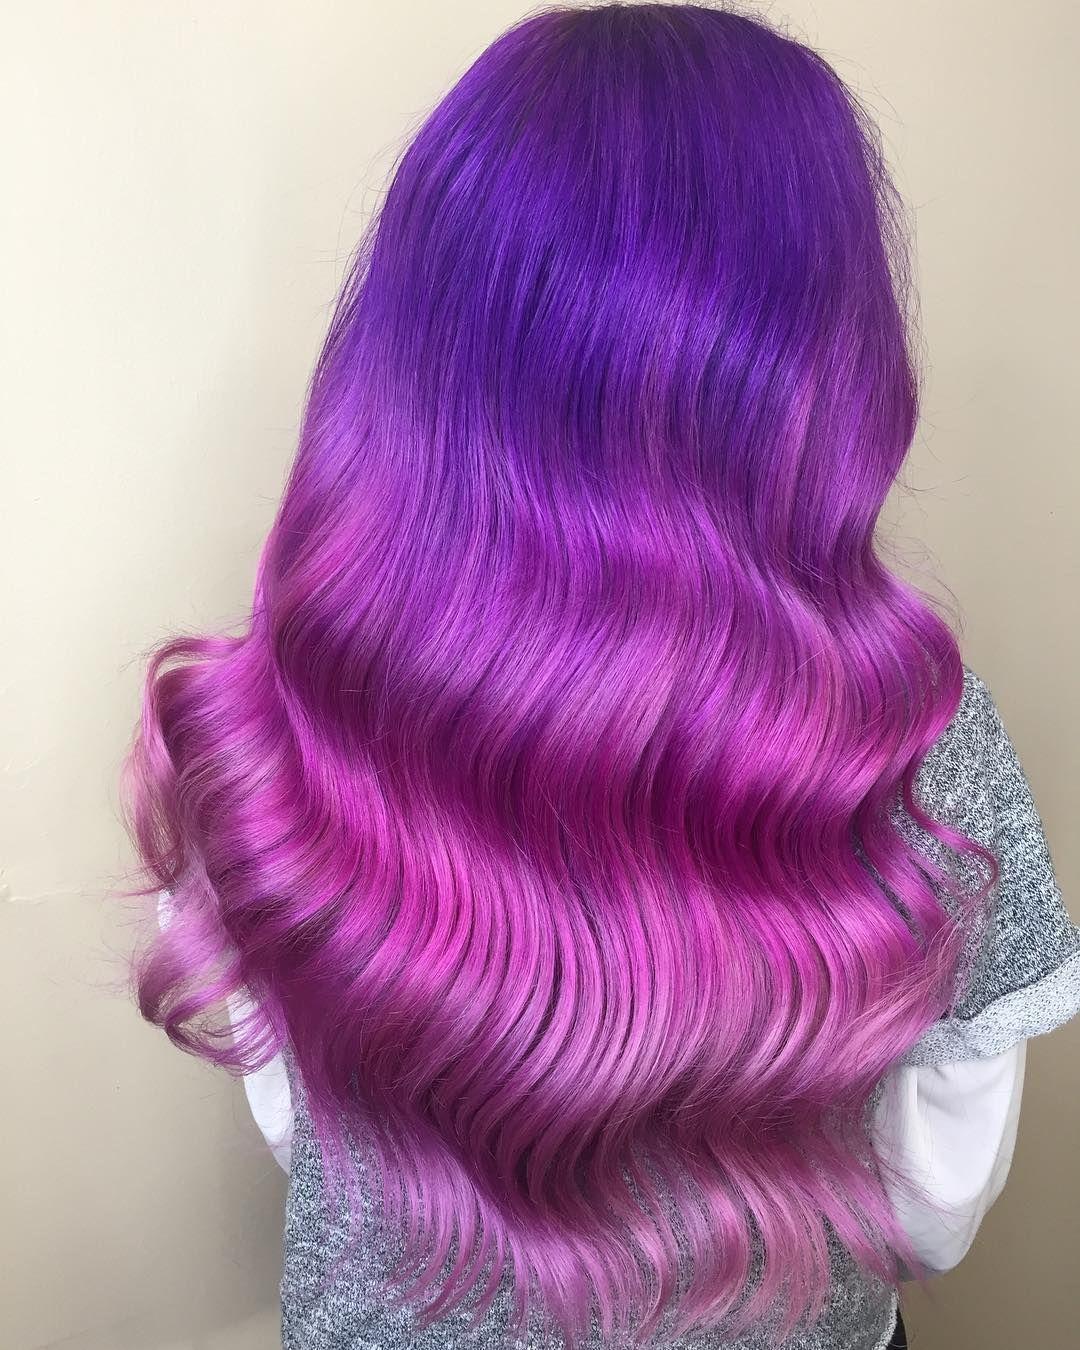 Hairbystephscissorhands colorful hair inspirations pinterest